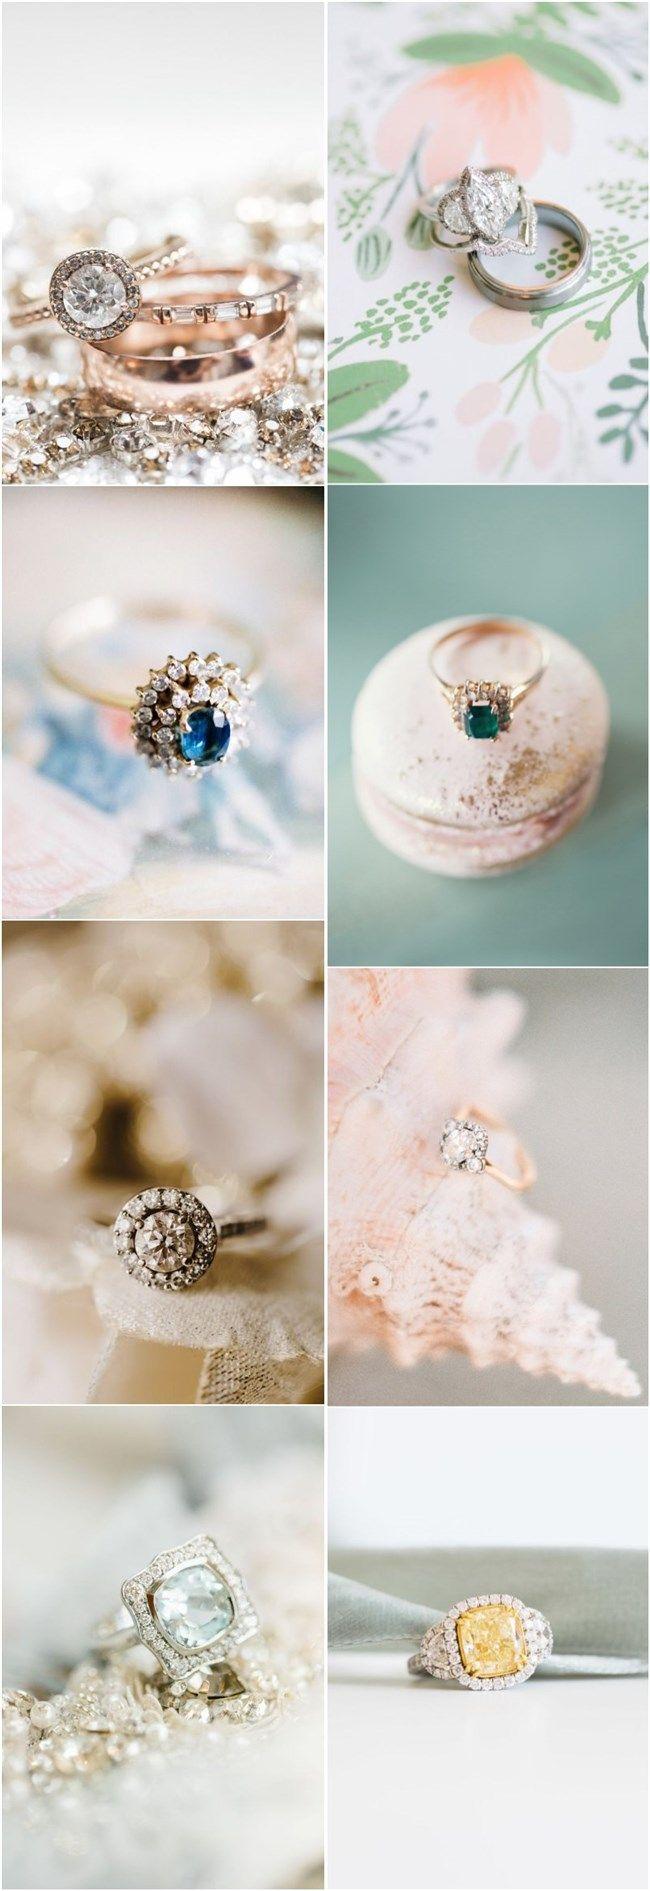 vintage engagement rings-diamond engagement rings